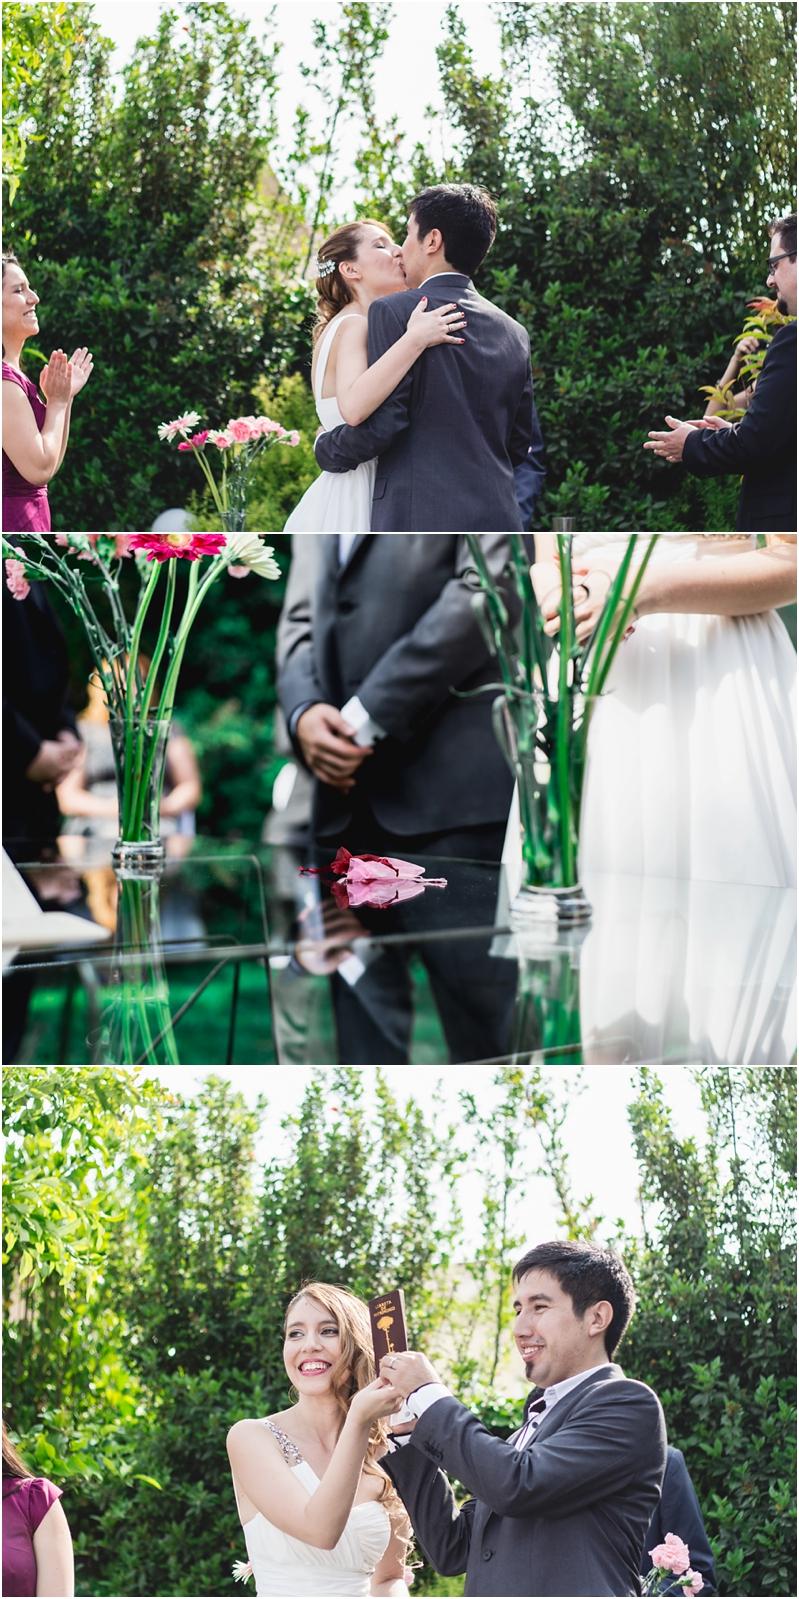 Fotografía Matrimonio Civil: Ceremonia